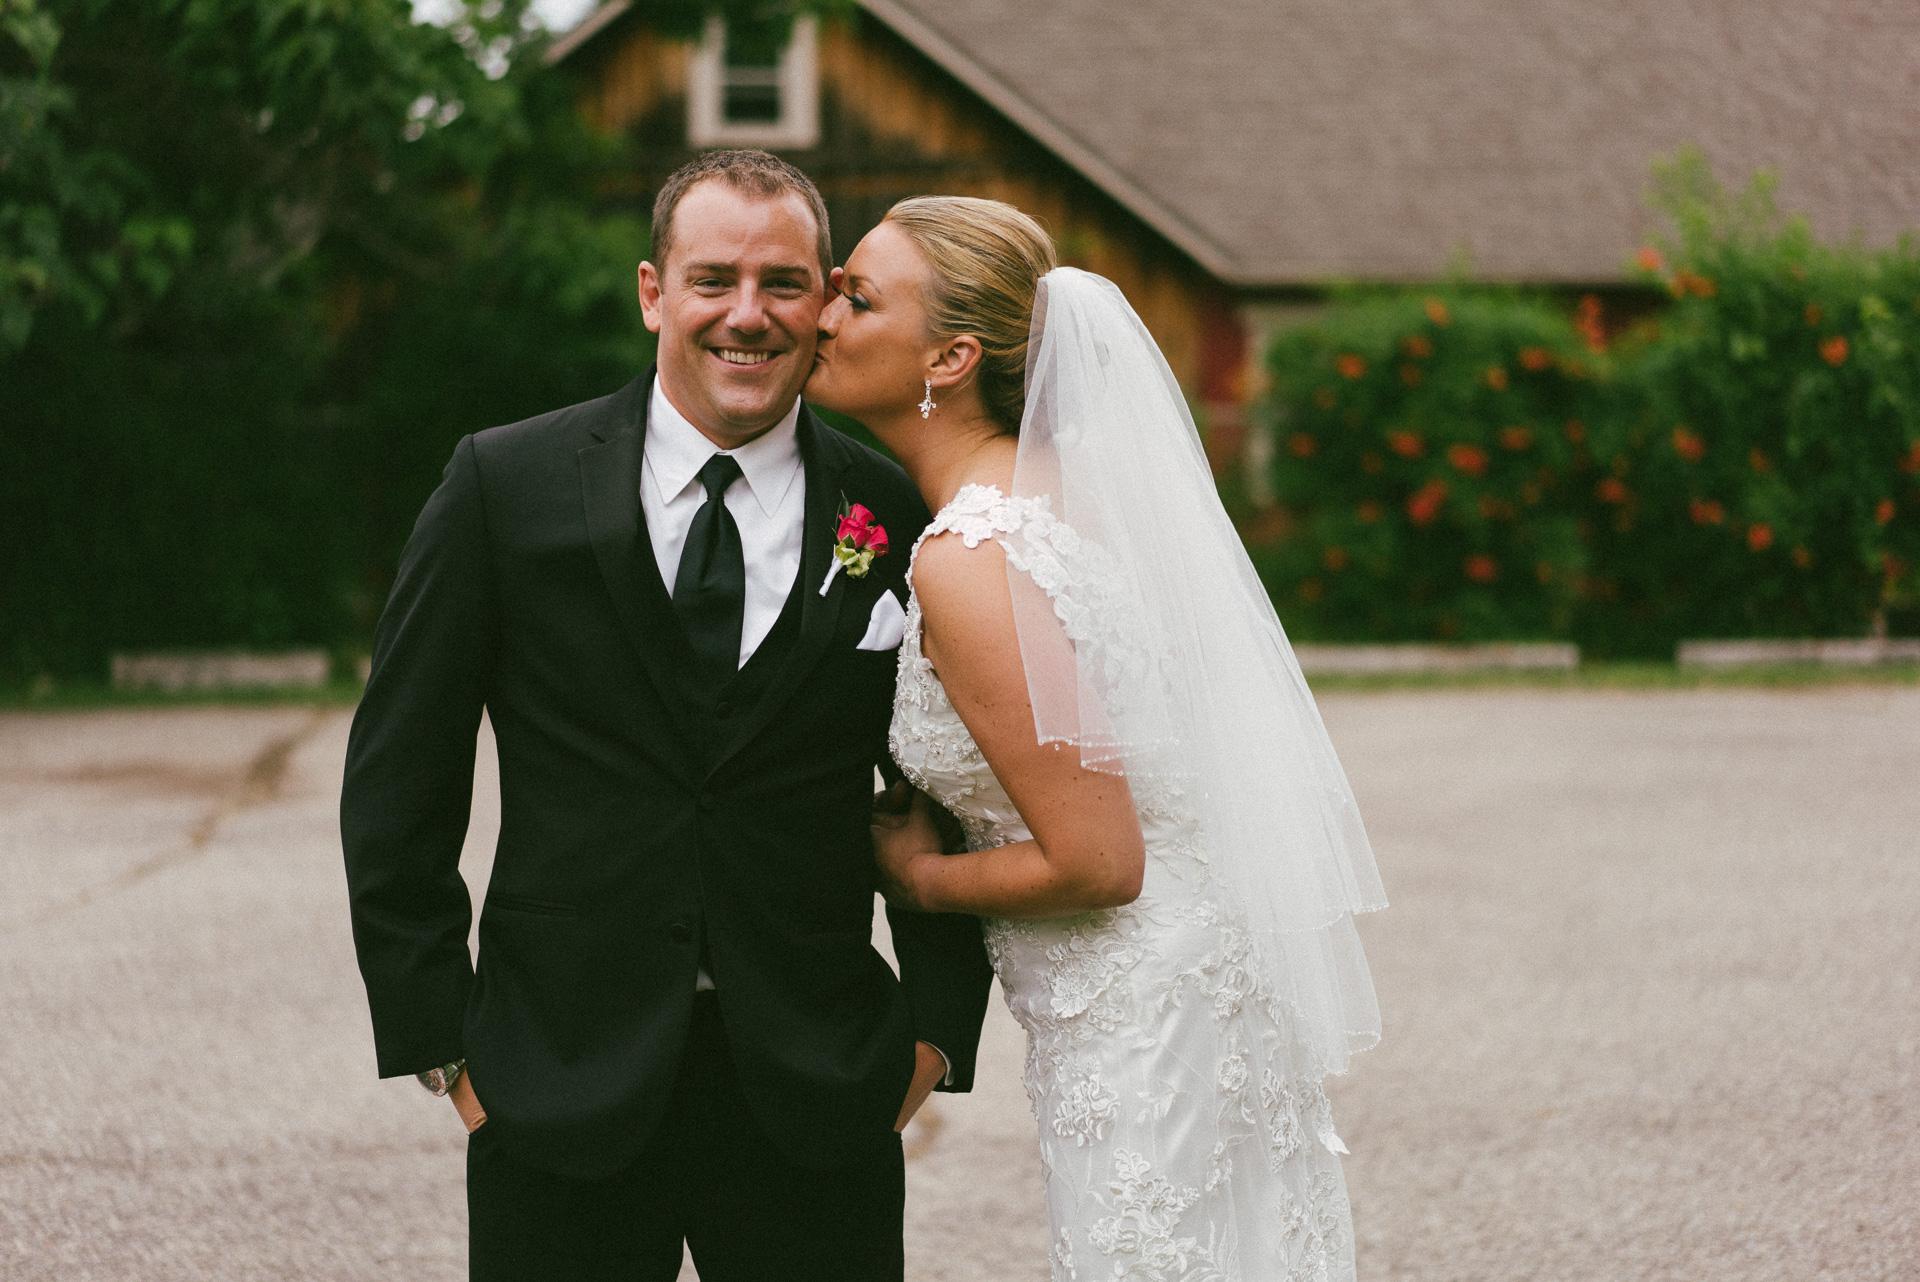 Dayton Wedding Photographer - Bride kissing Groom